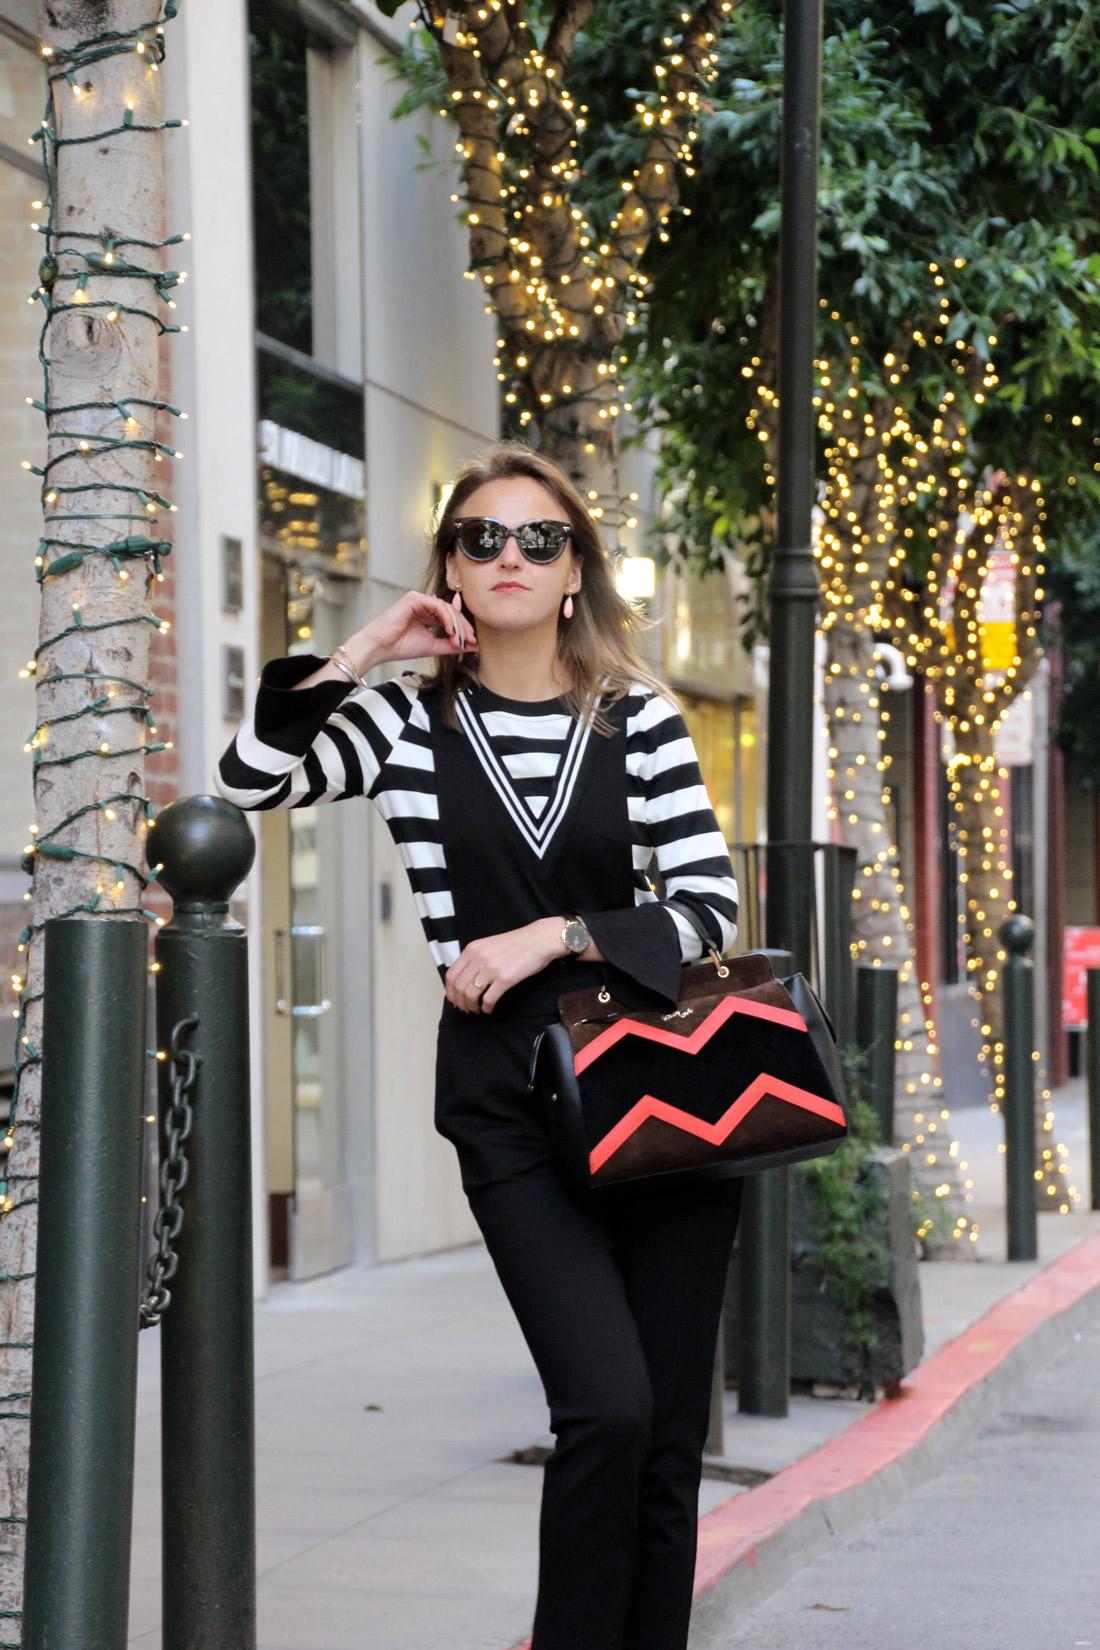 bag-at-you-fashion-blog-missco-girl-handbag